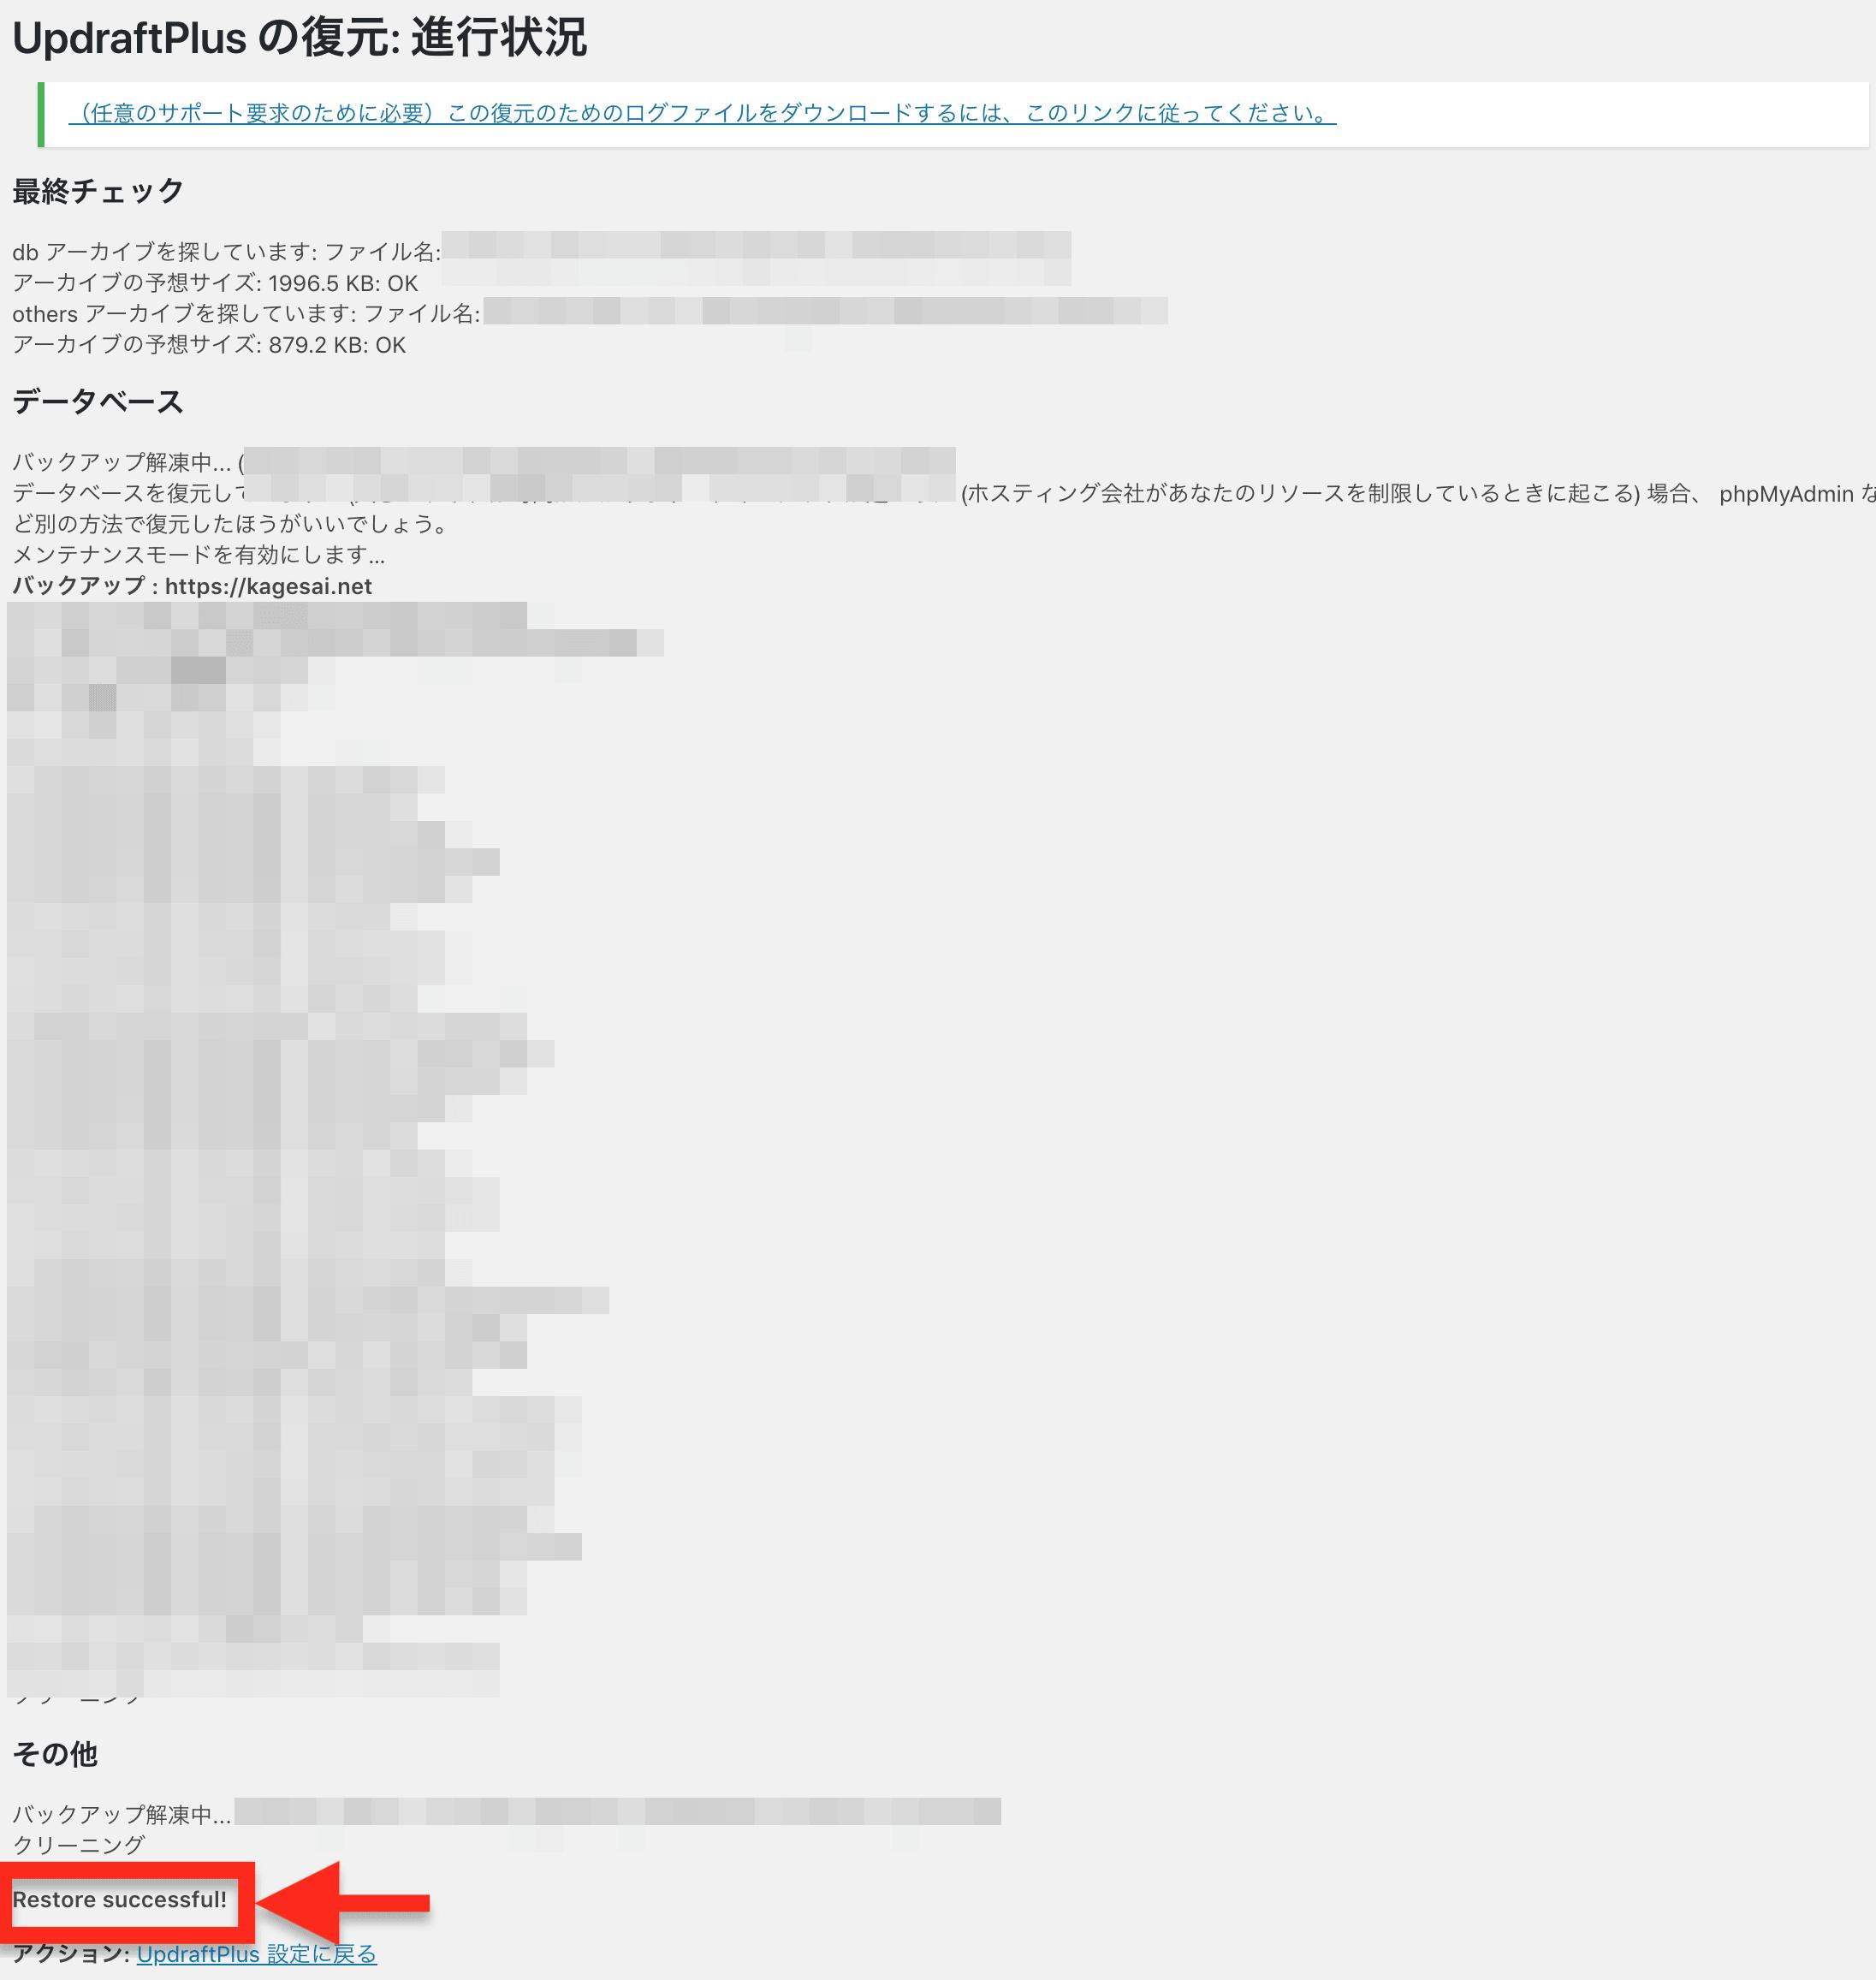 UpdraftPlus-Backup/Restore復元進行状況